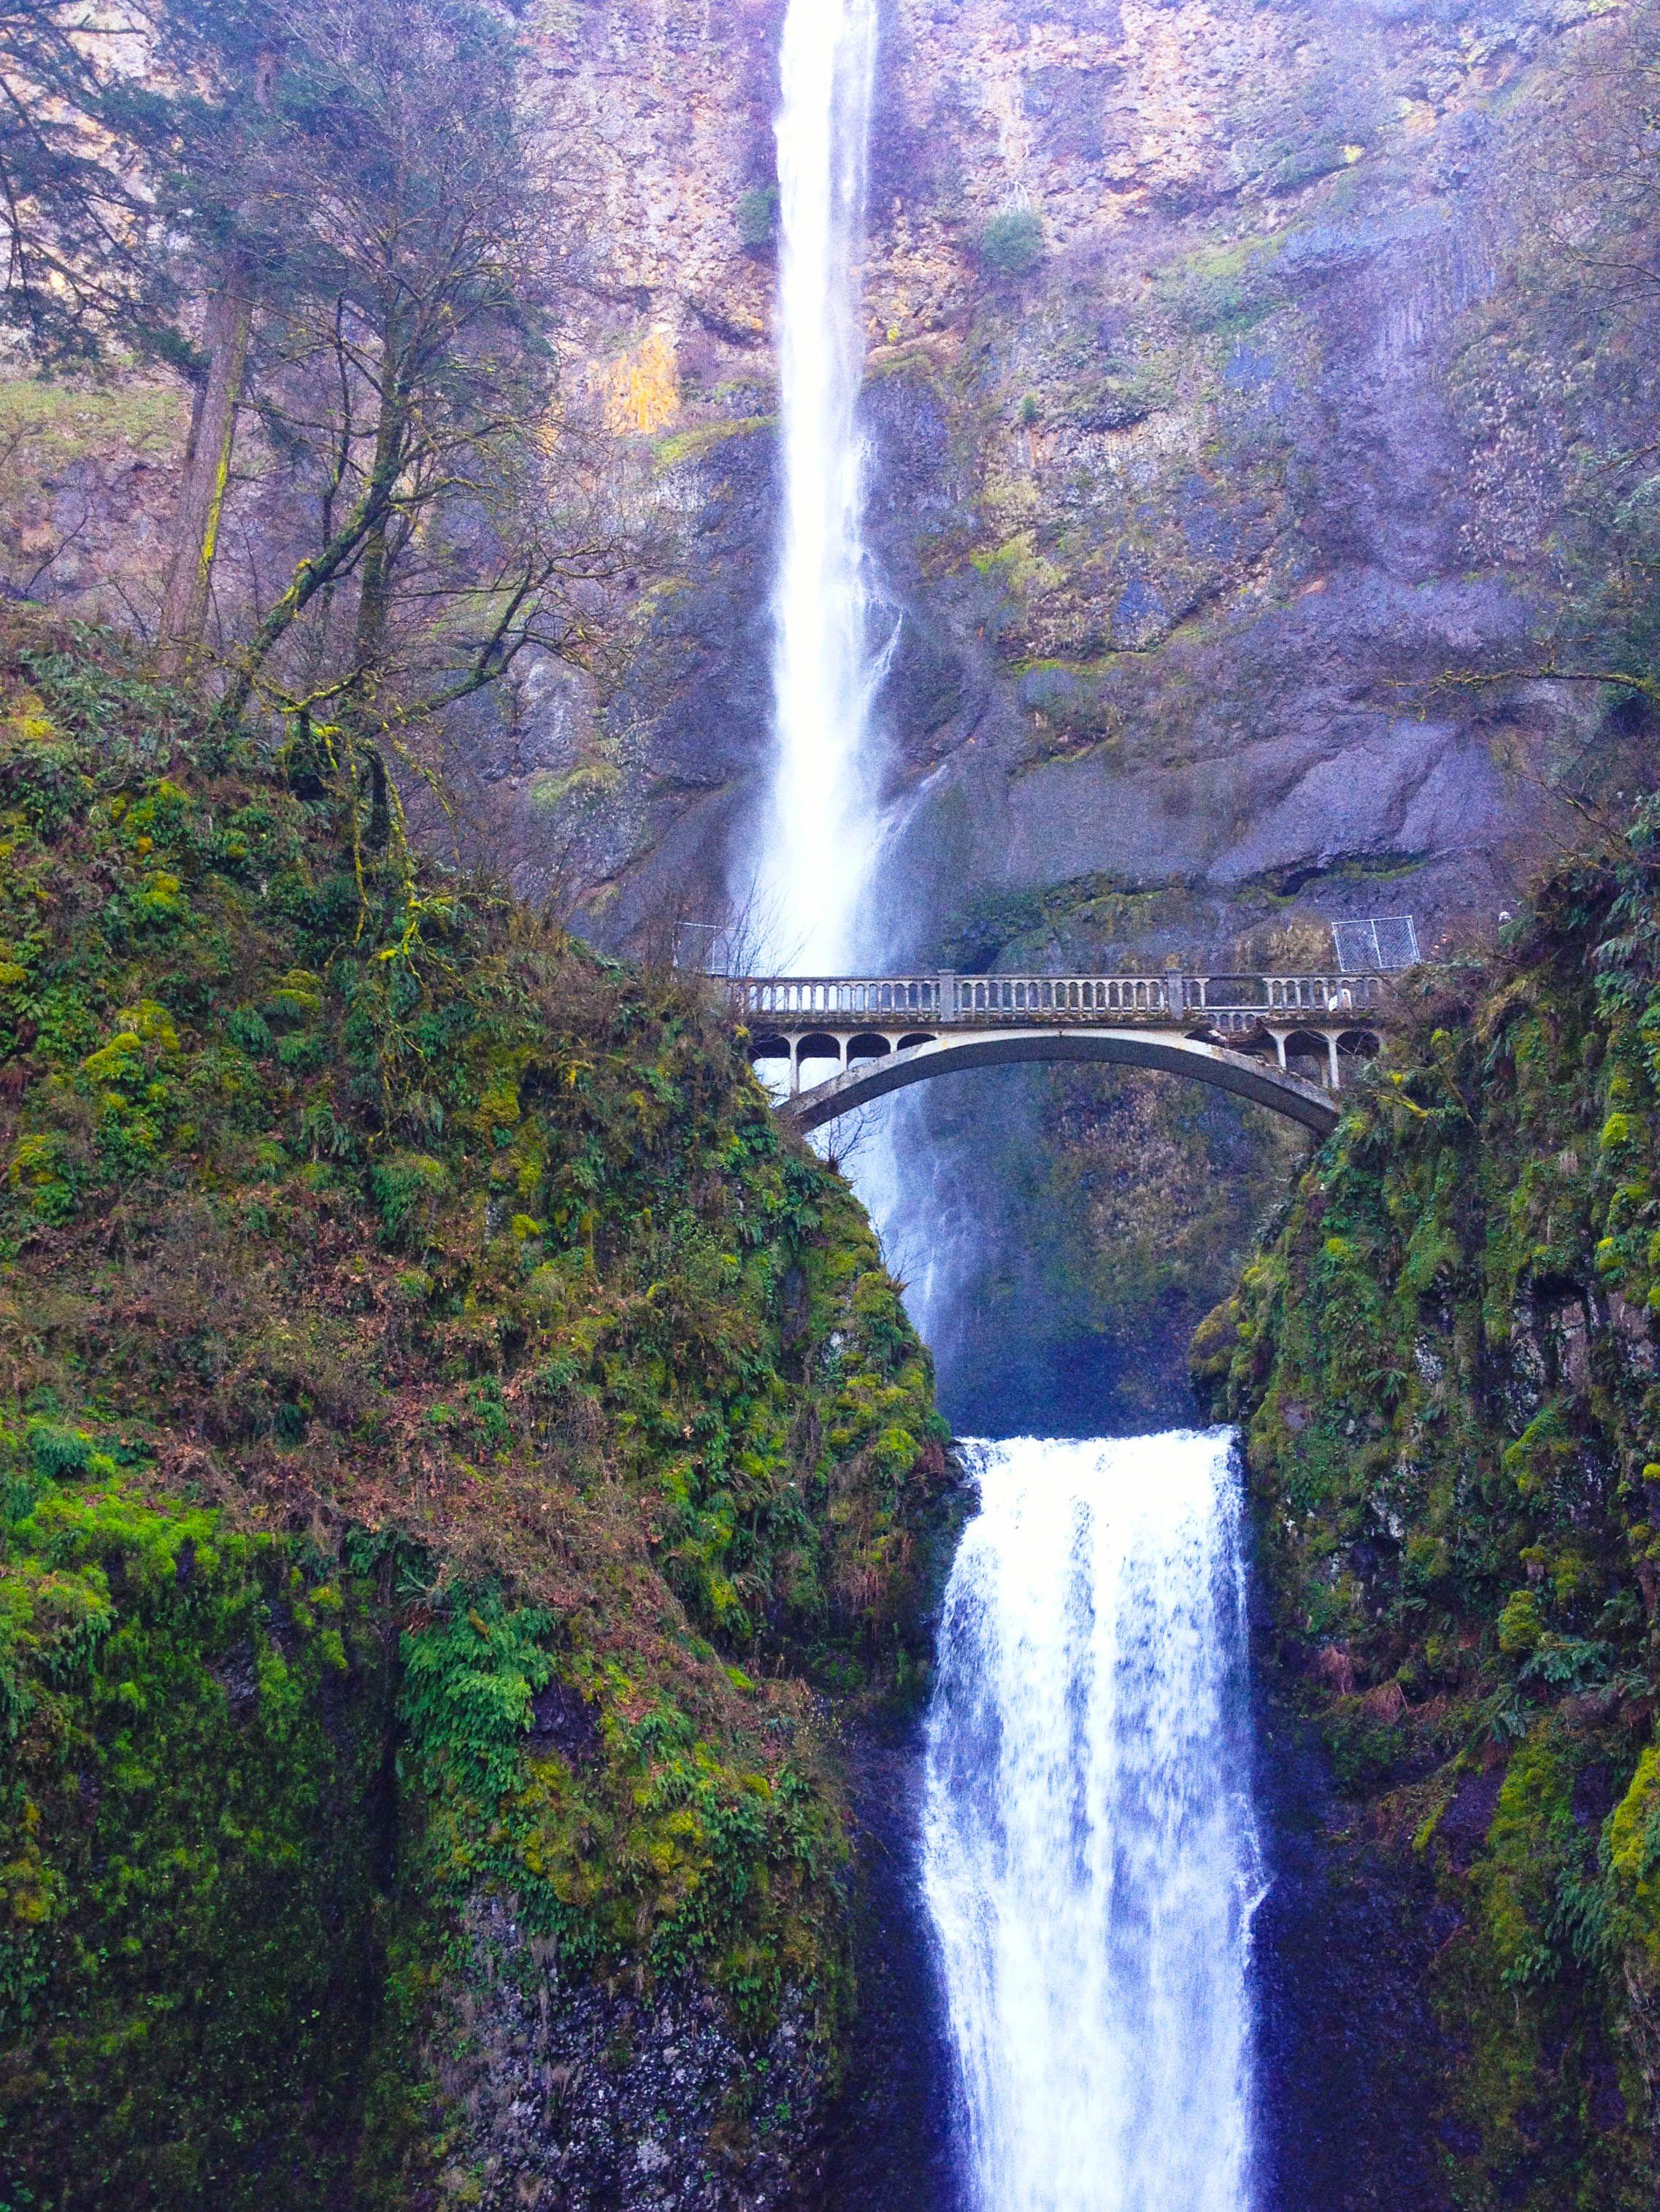 The Best Waterfall Hikes Near Portland, Oregon Hikes